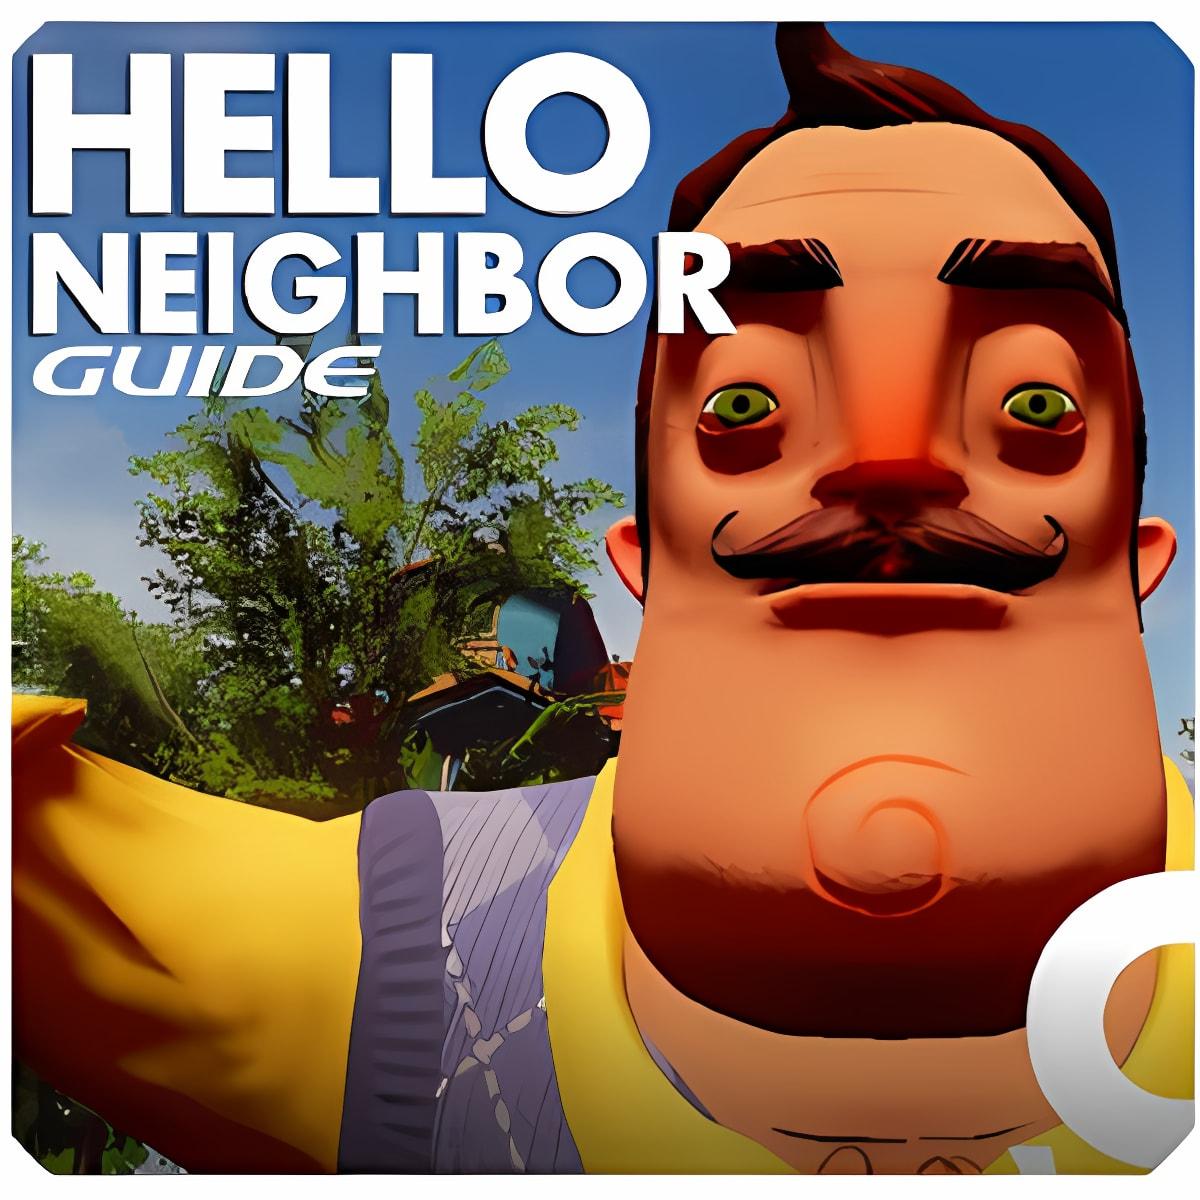 Guide for Hello Neighbor